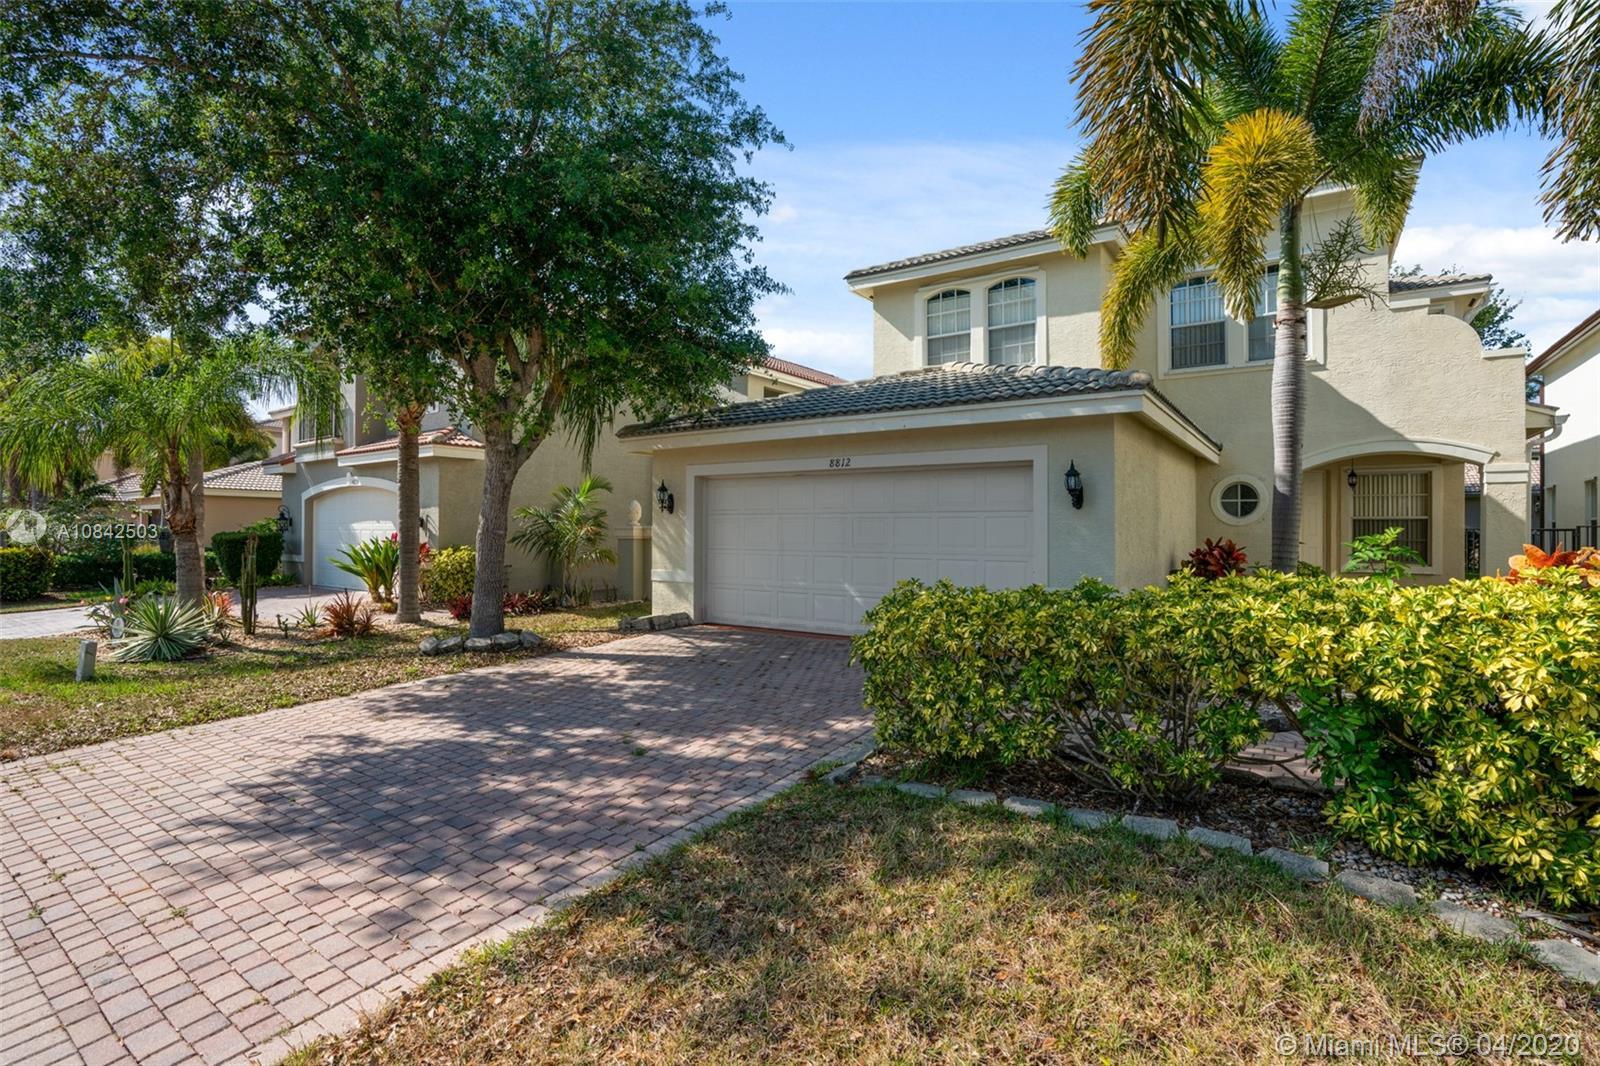 8812 Sandy Crest Lane Property Photo - Boynton Beach, FL real estate listing